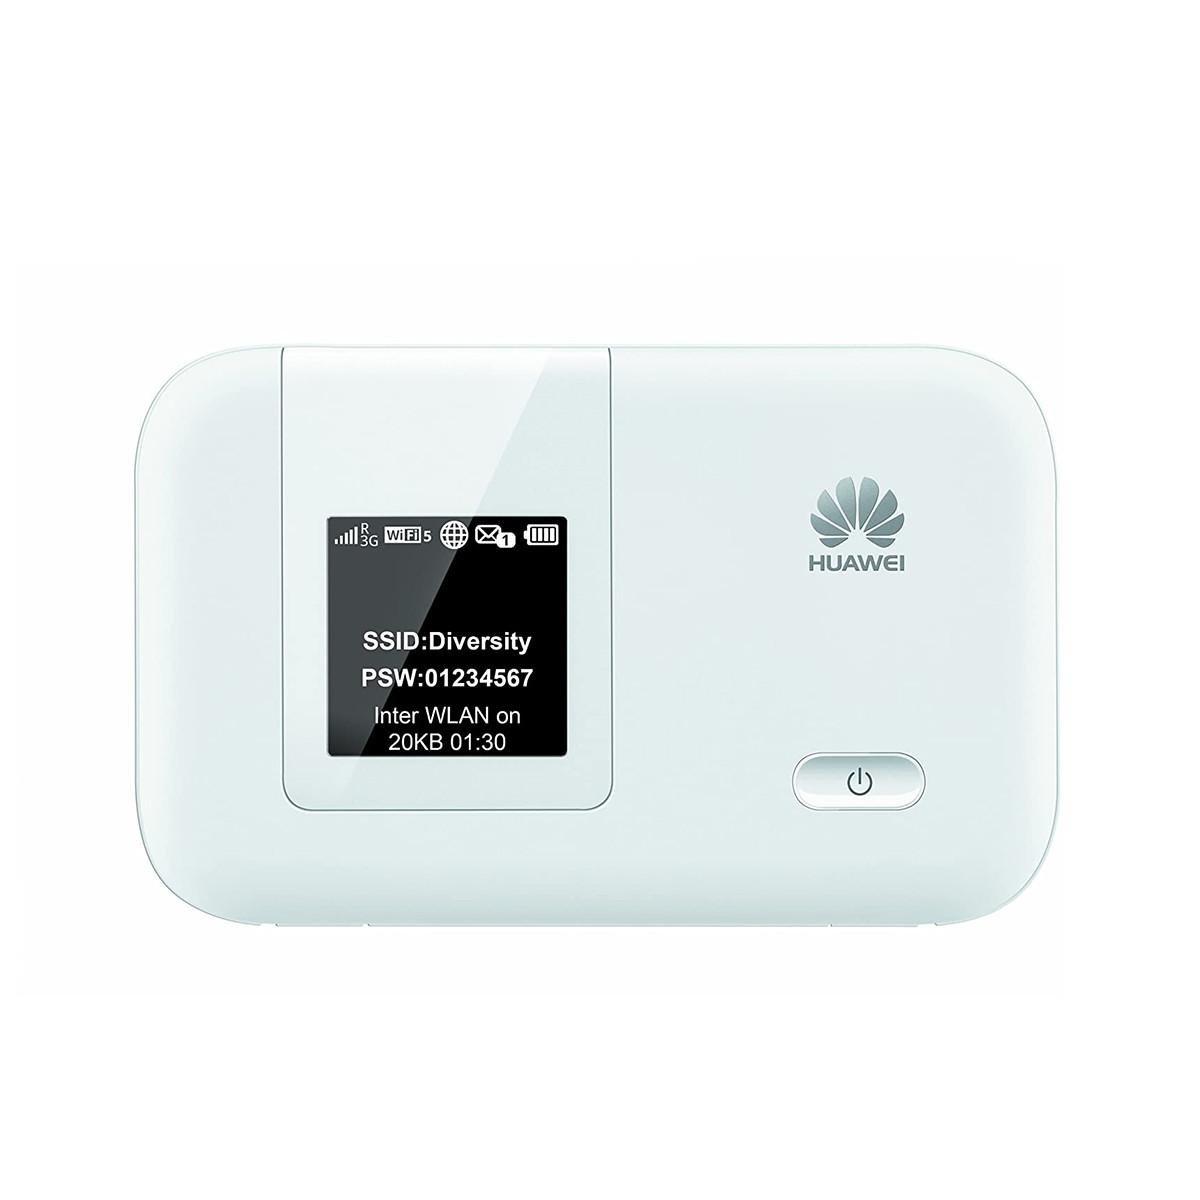 4G LTE WiFi роутер Huawei E5372s-32 (Киевстар, Vodafone, Lifecell)